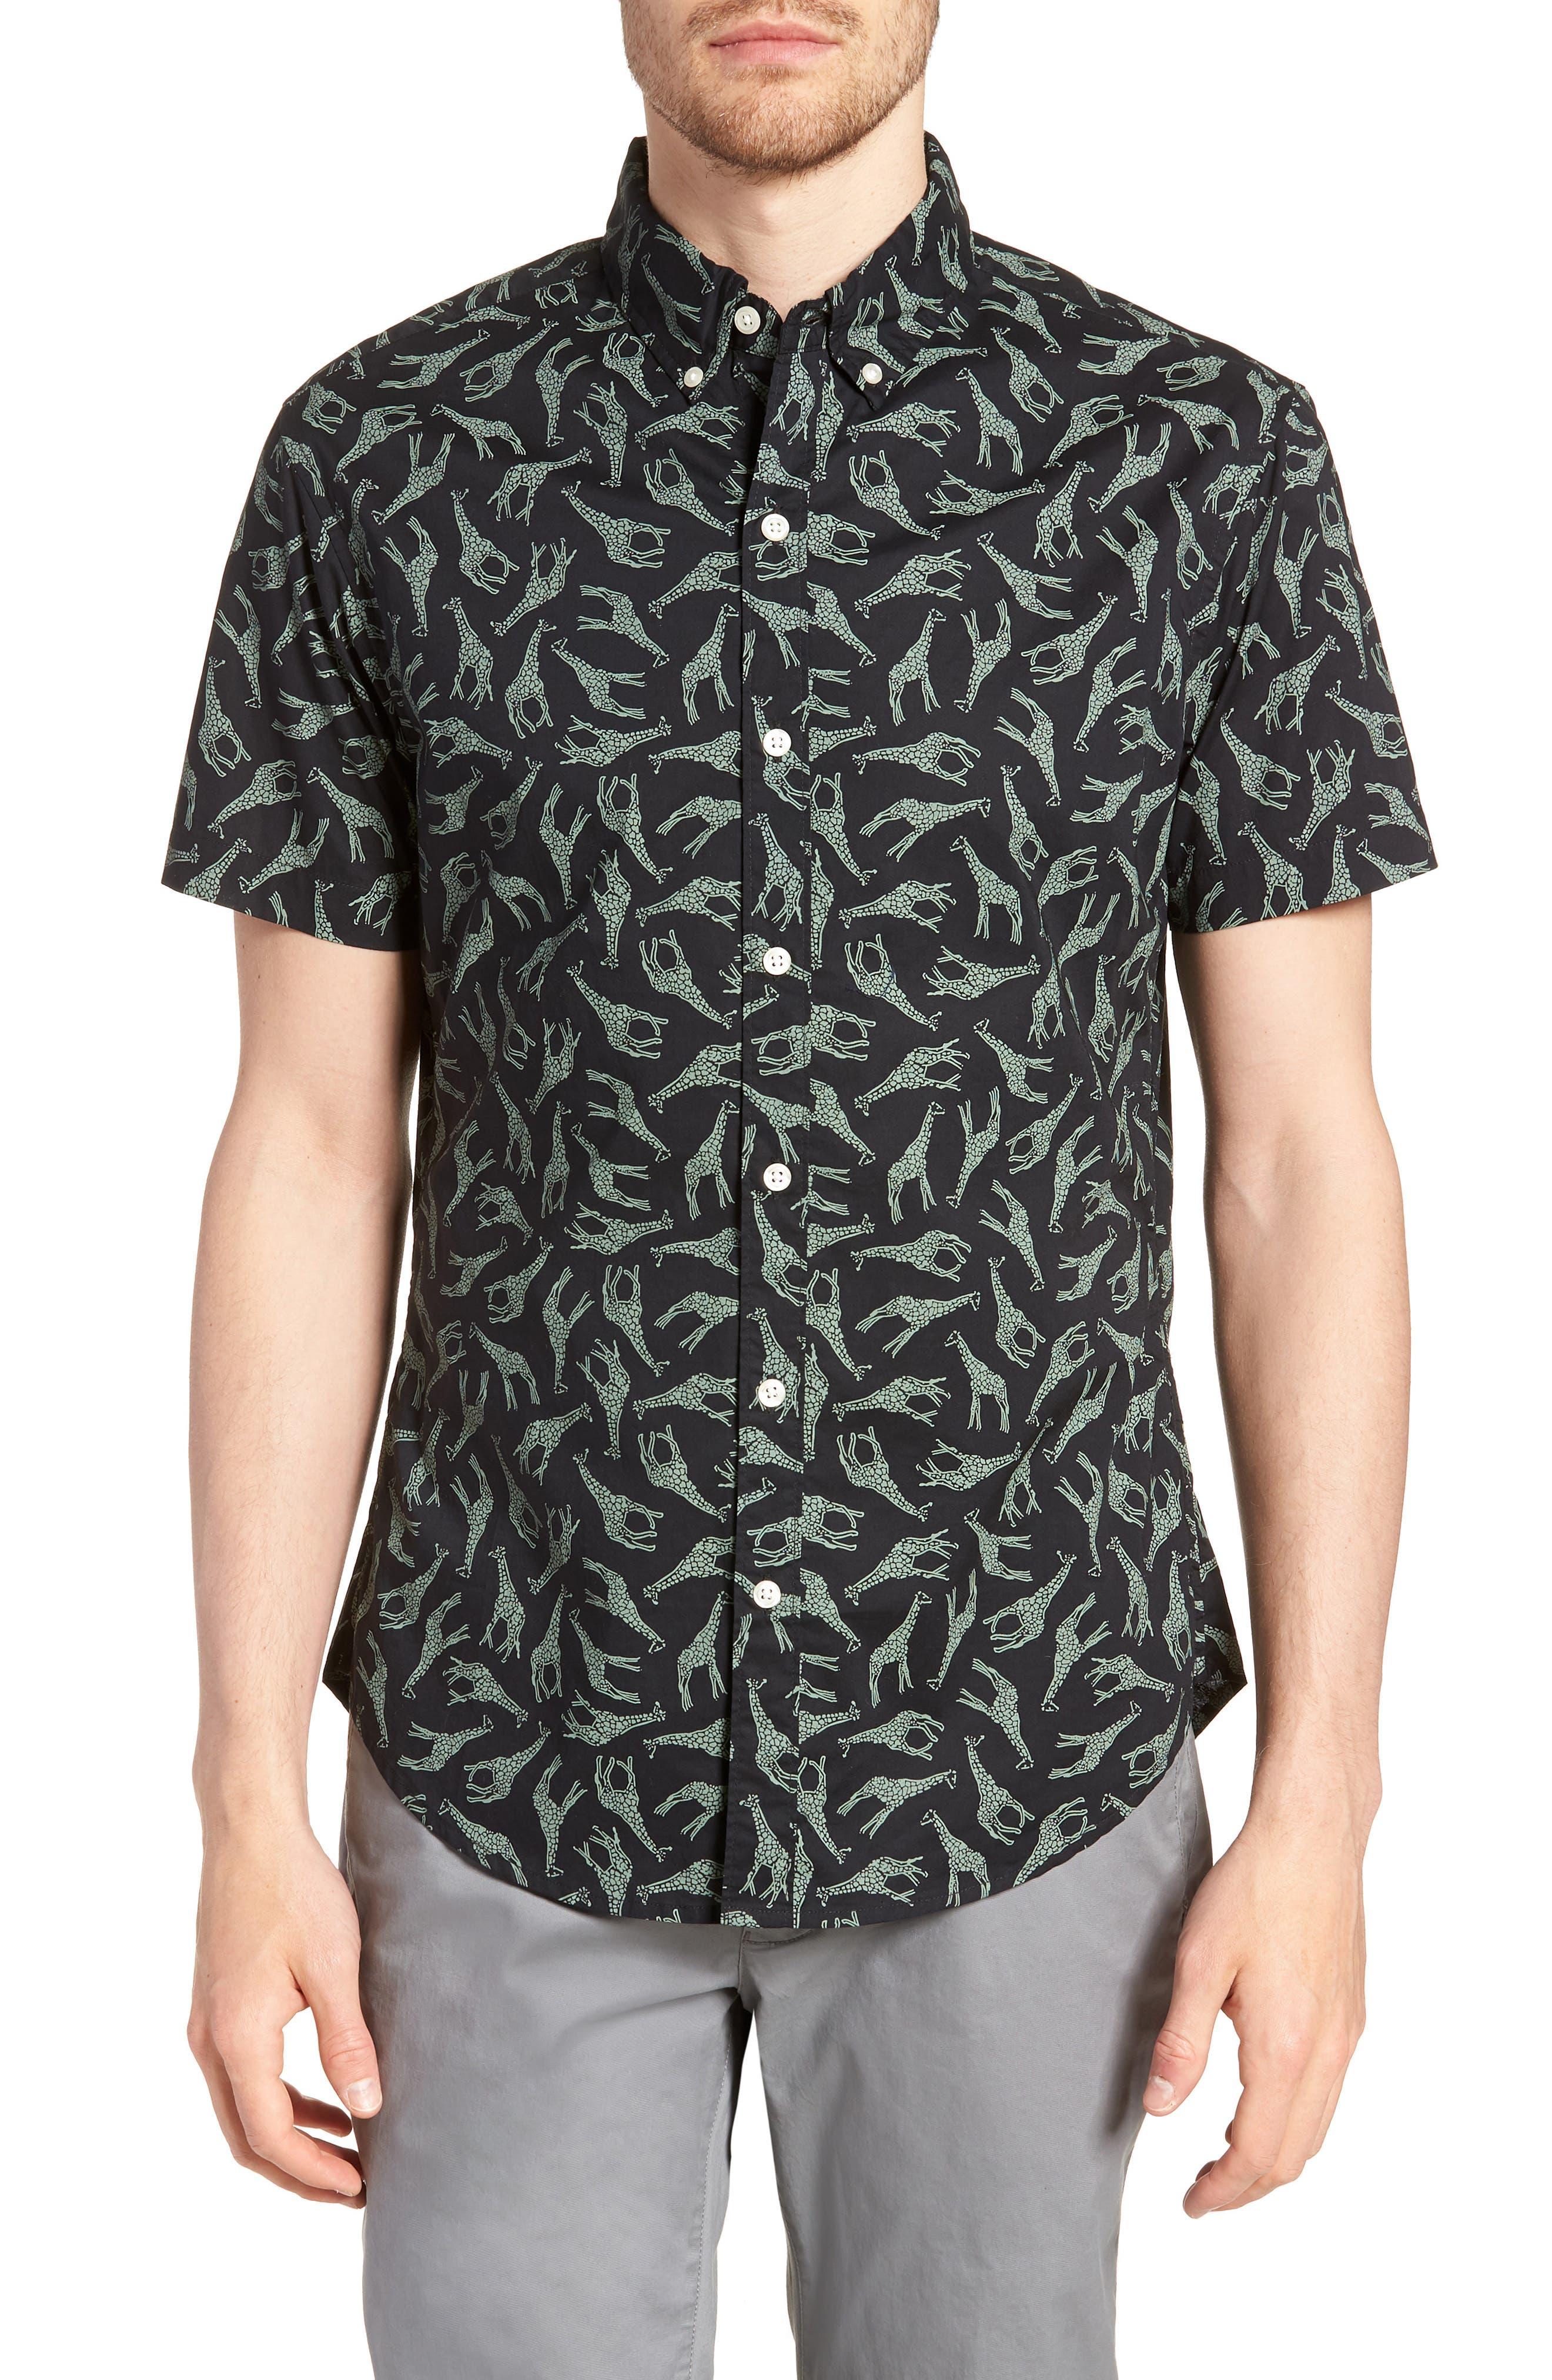 BONOBOS Riviera Slim Fit Giraffe Print Sport Shirt, Main, color, 001